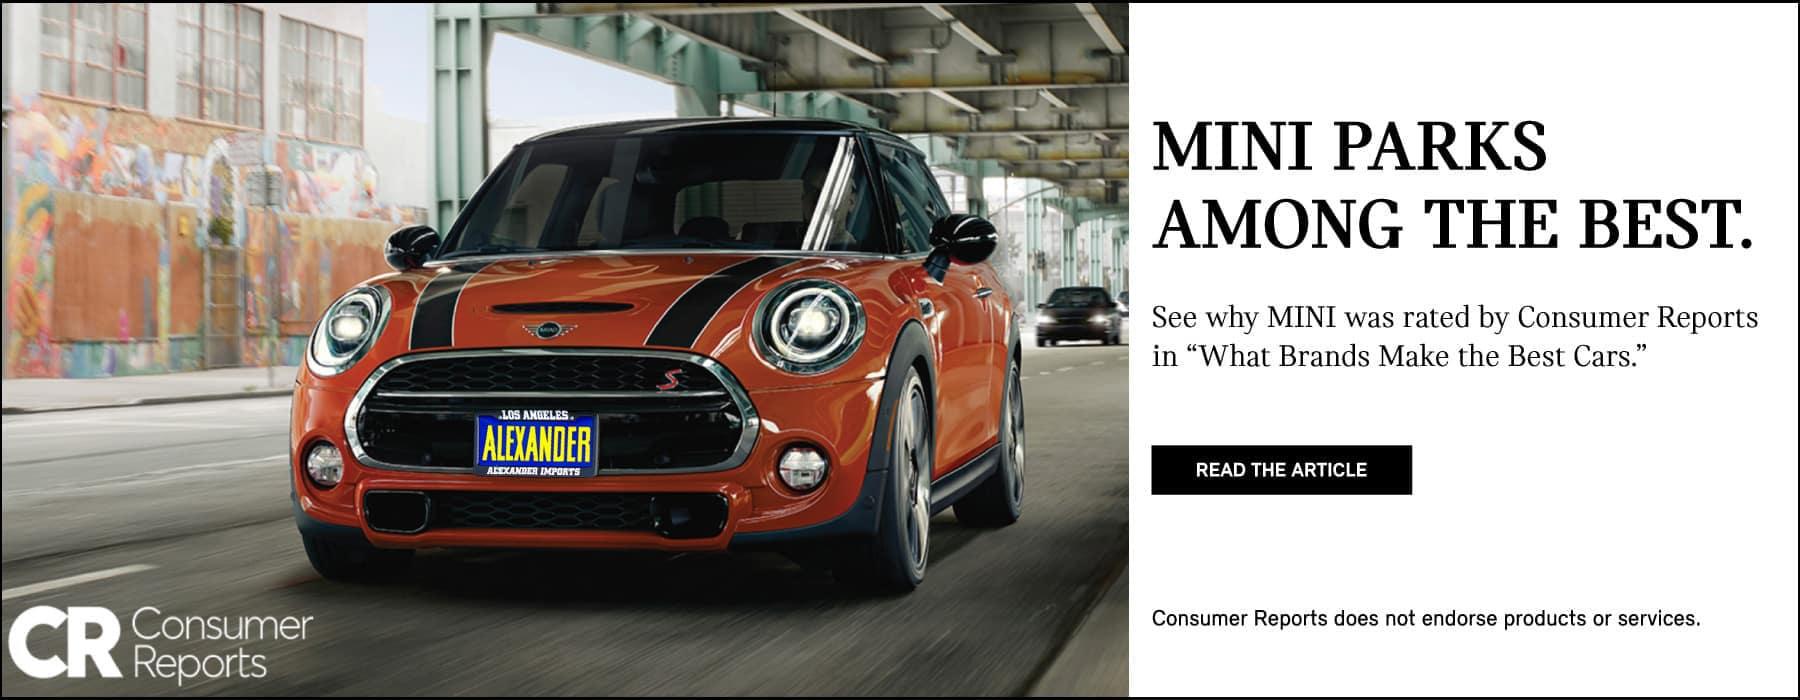 MINI parks among the best. Consumers Report. MINI Cooper S Hardtop 2 Door. Read the Article.